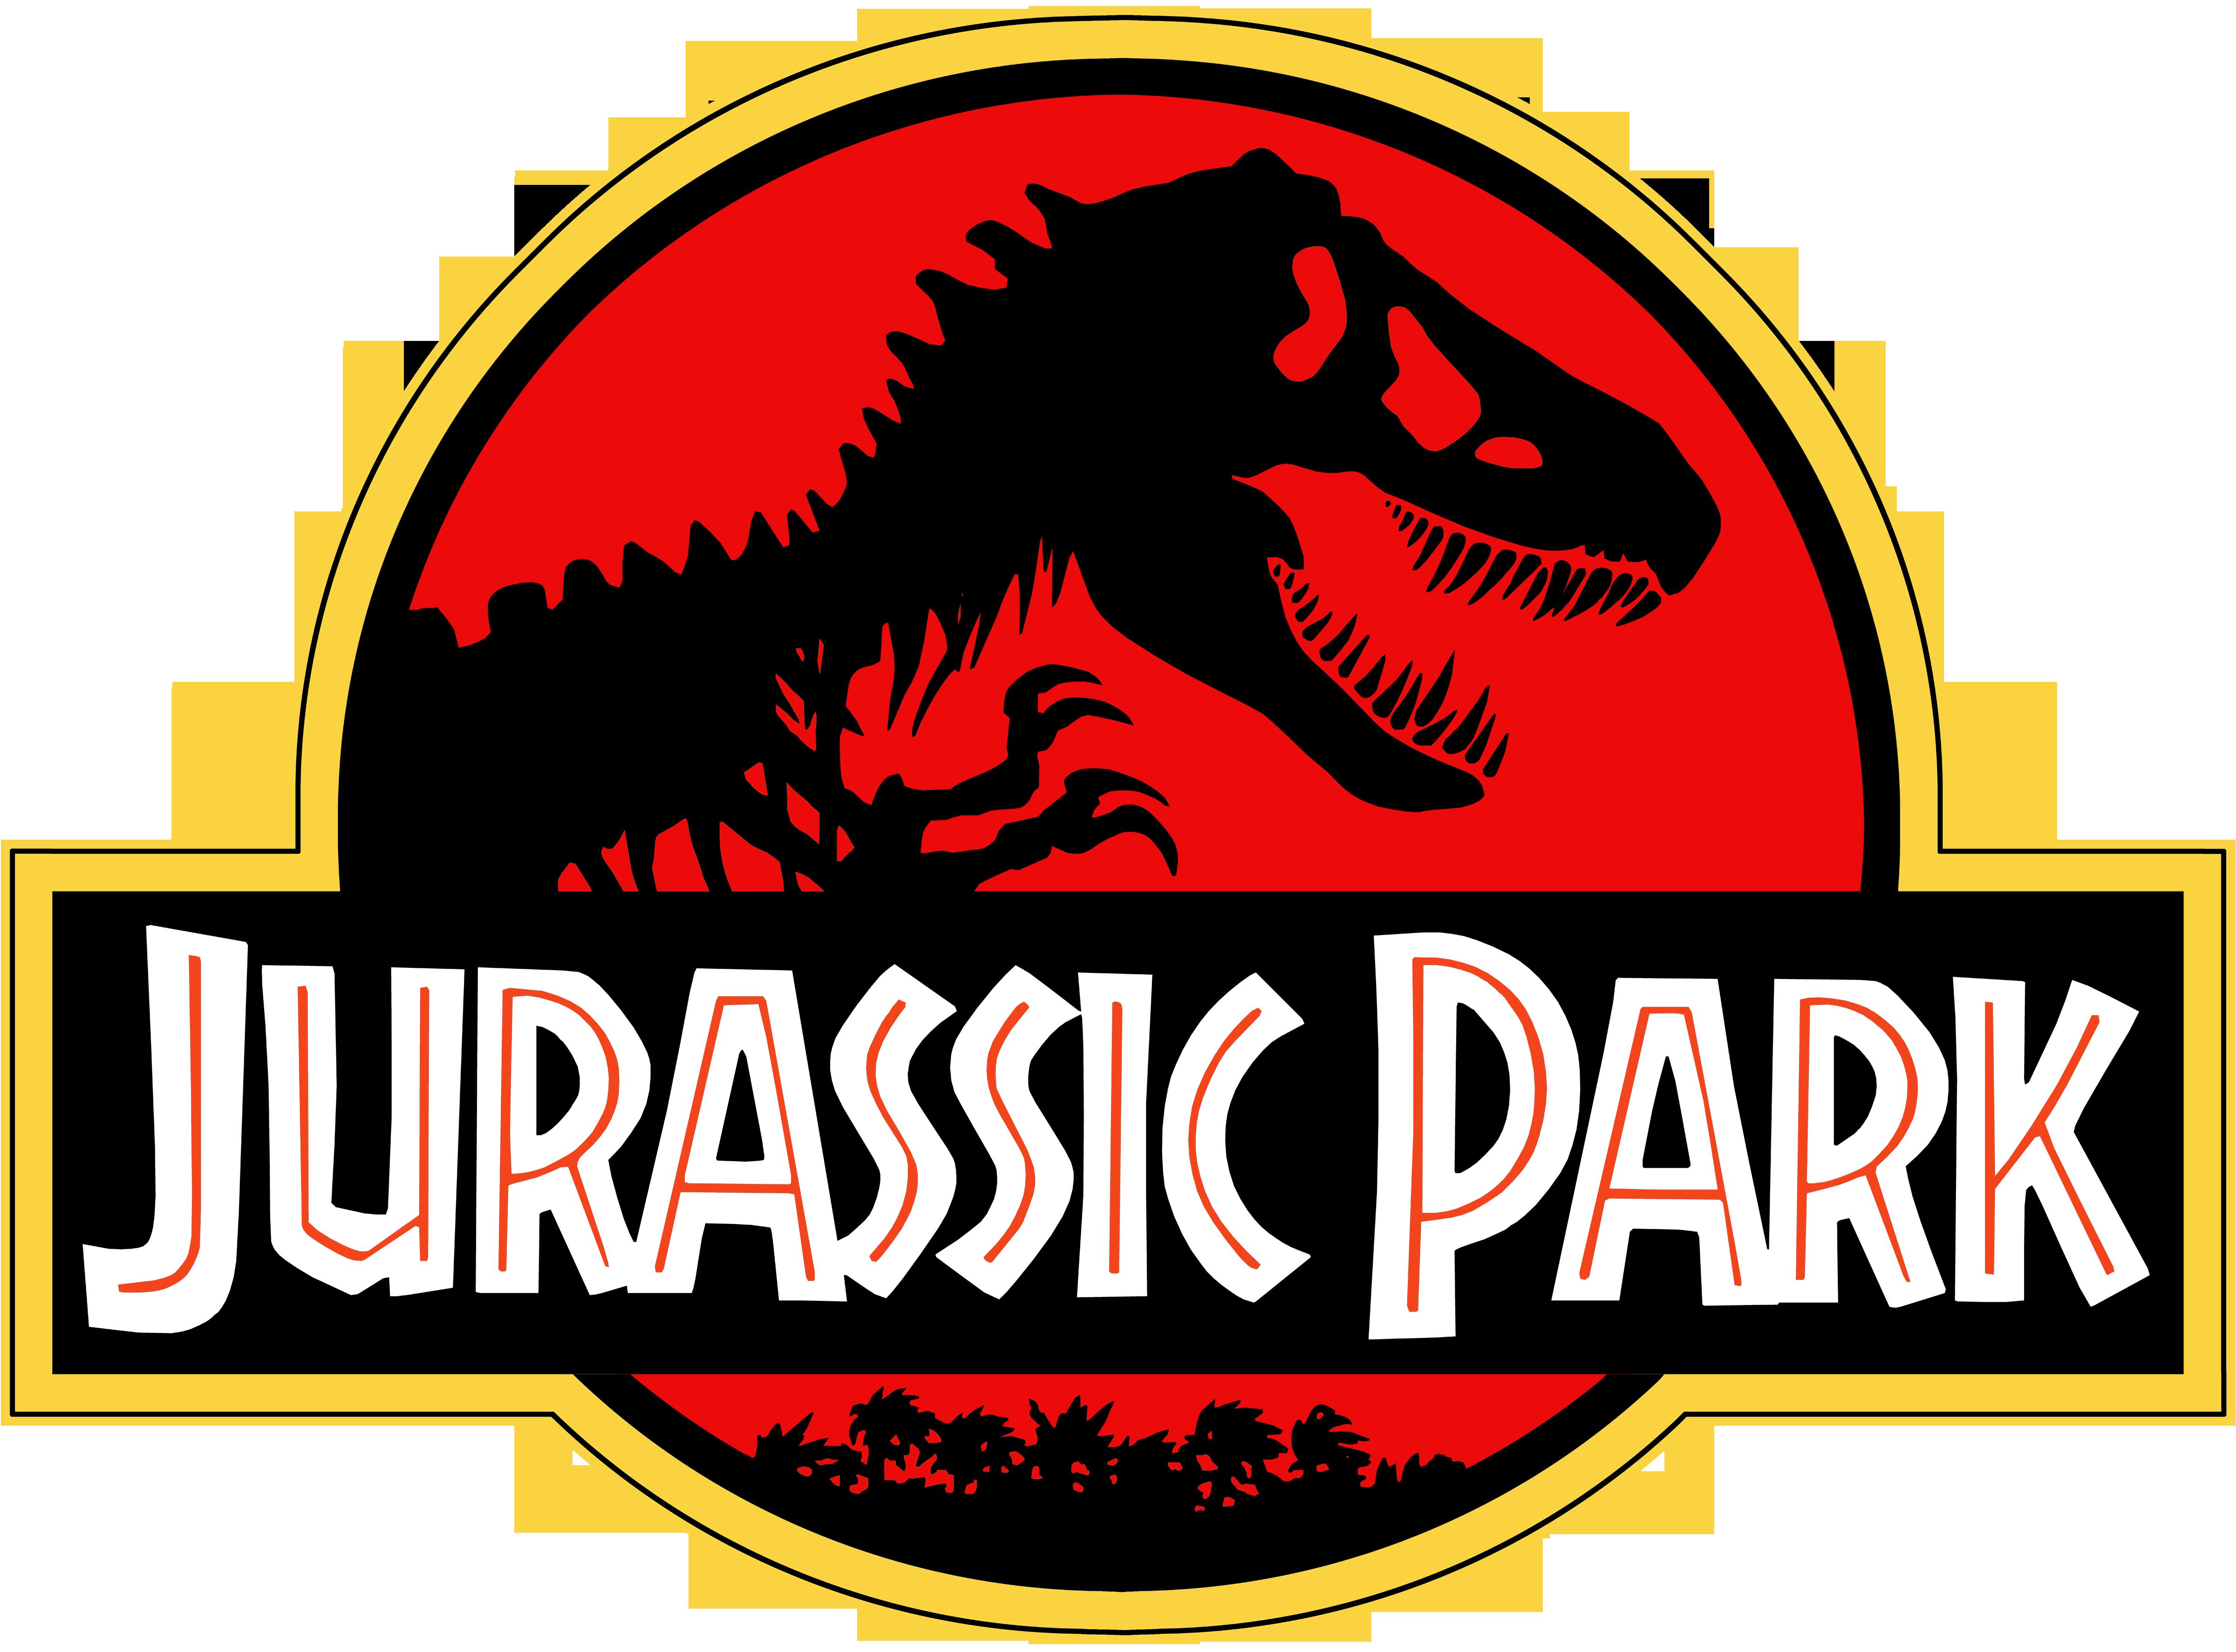 Jurassic png transparent images. Movie clipart park clipart